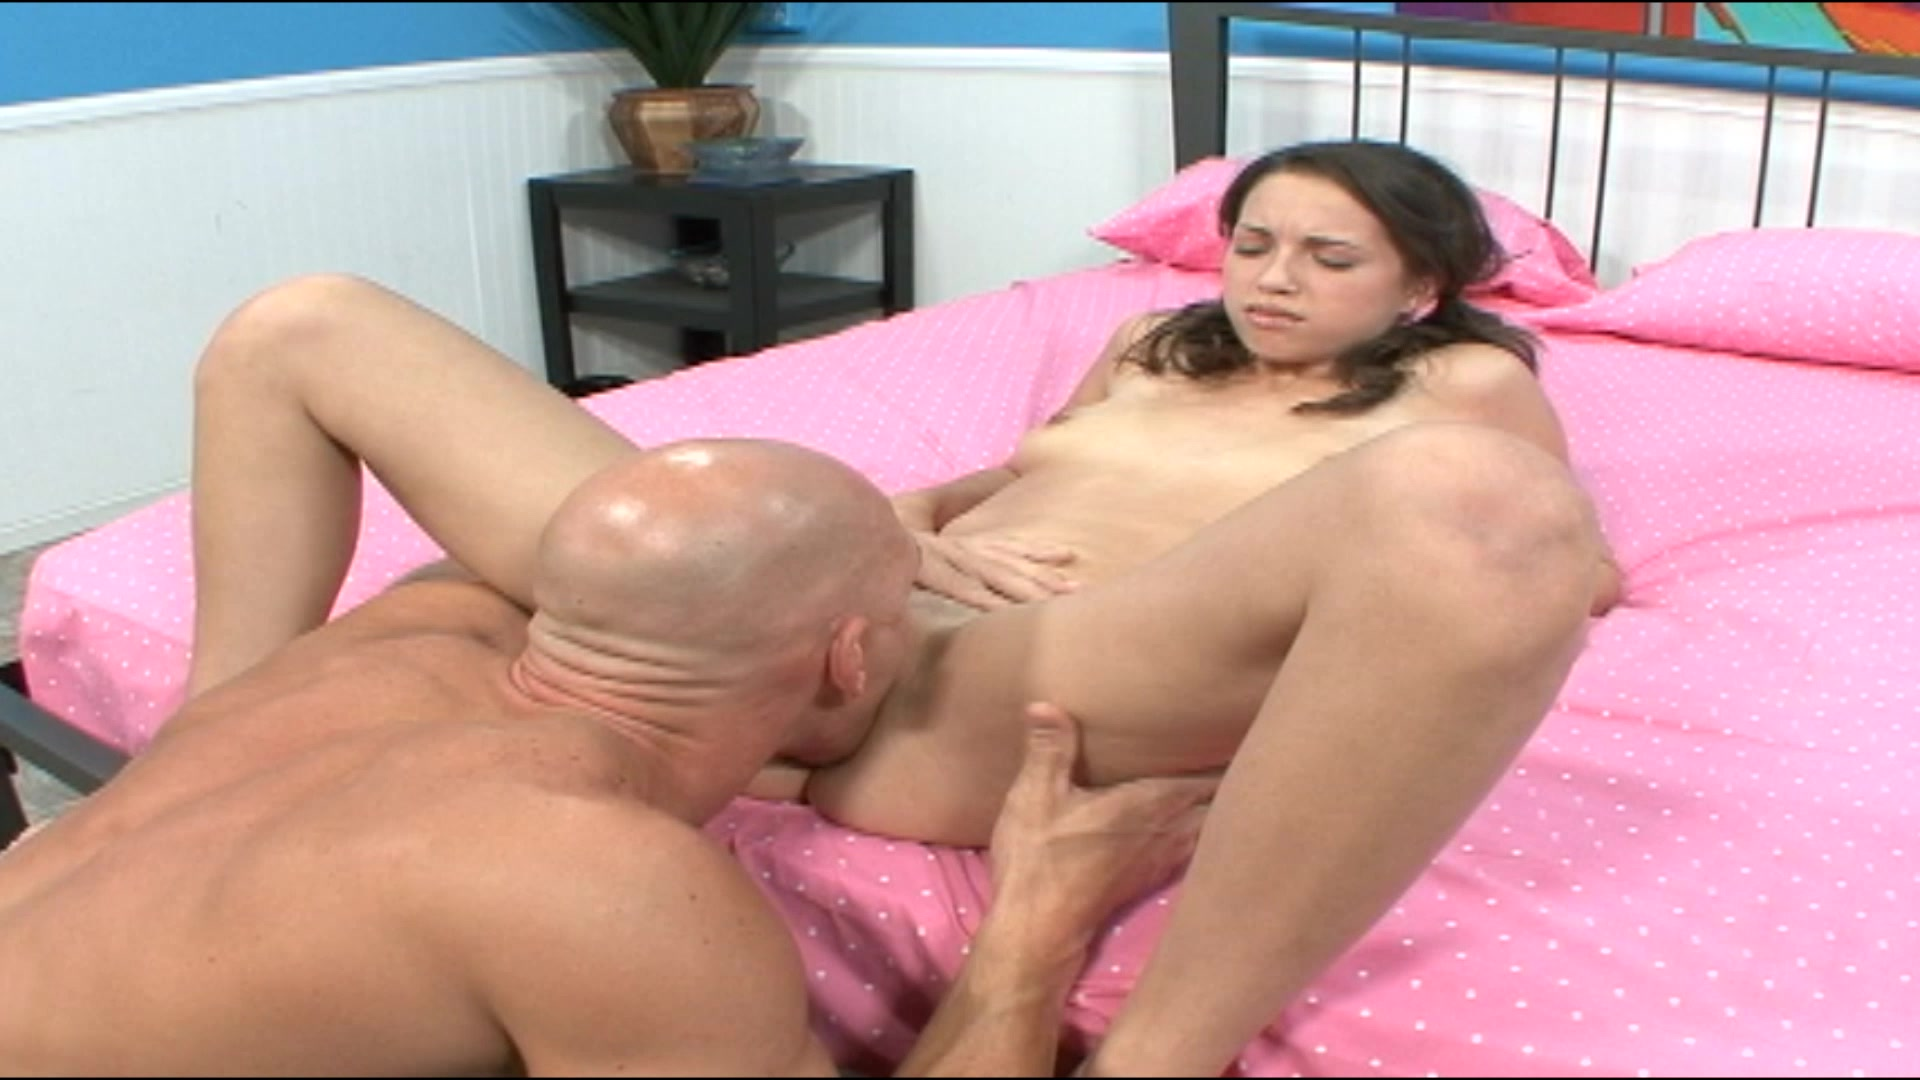 Teen girl grabbing a dick